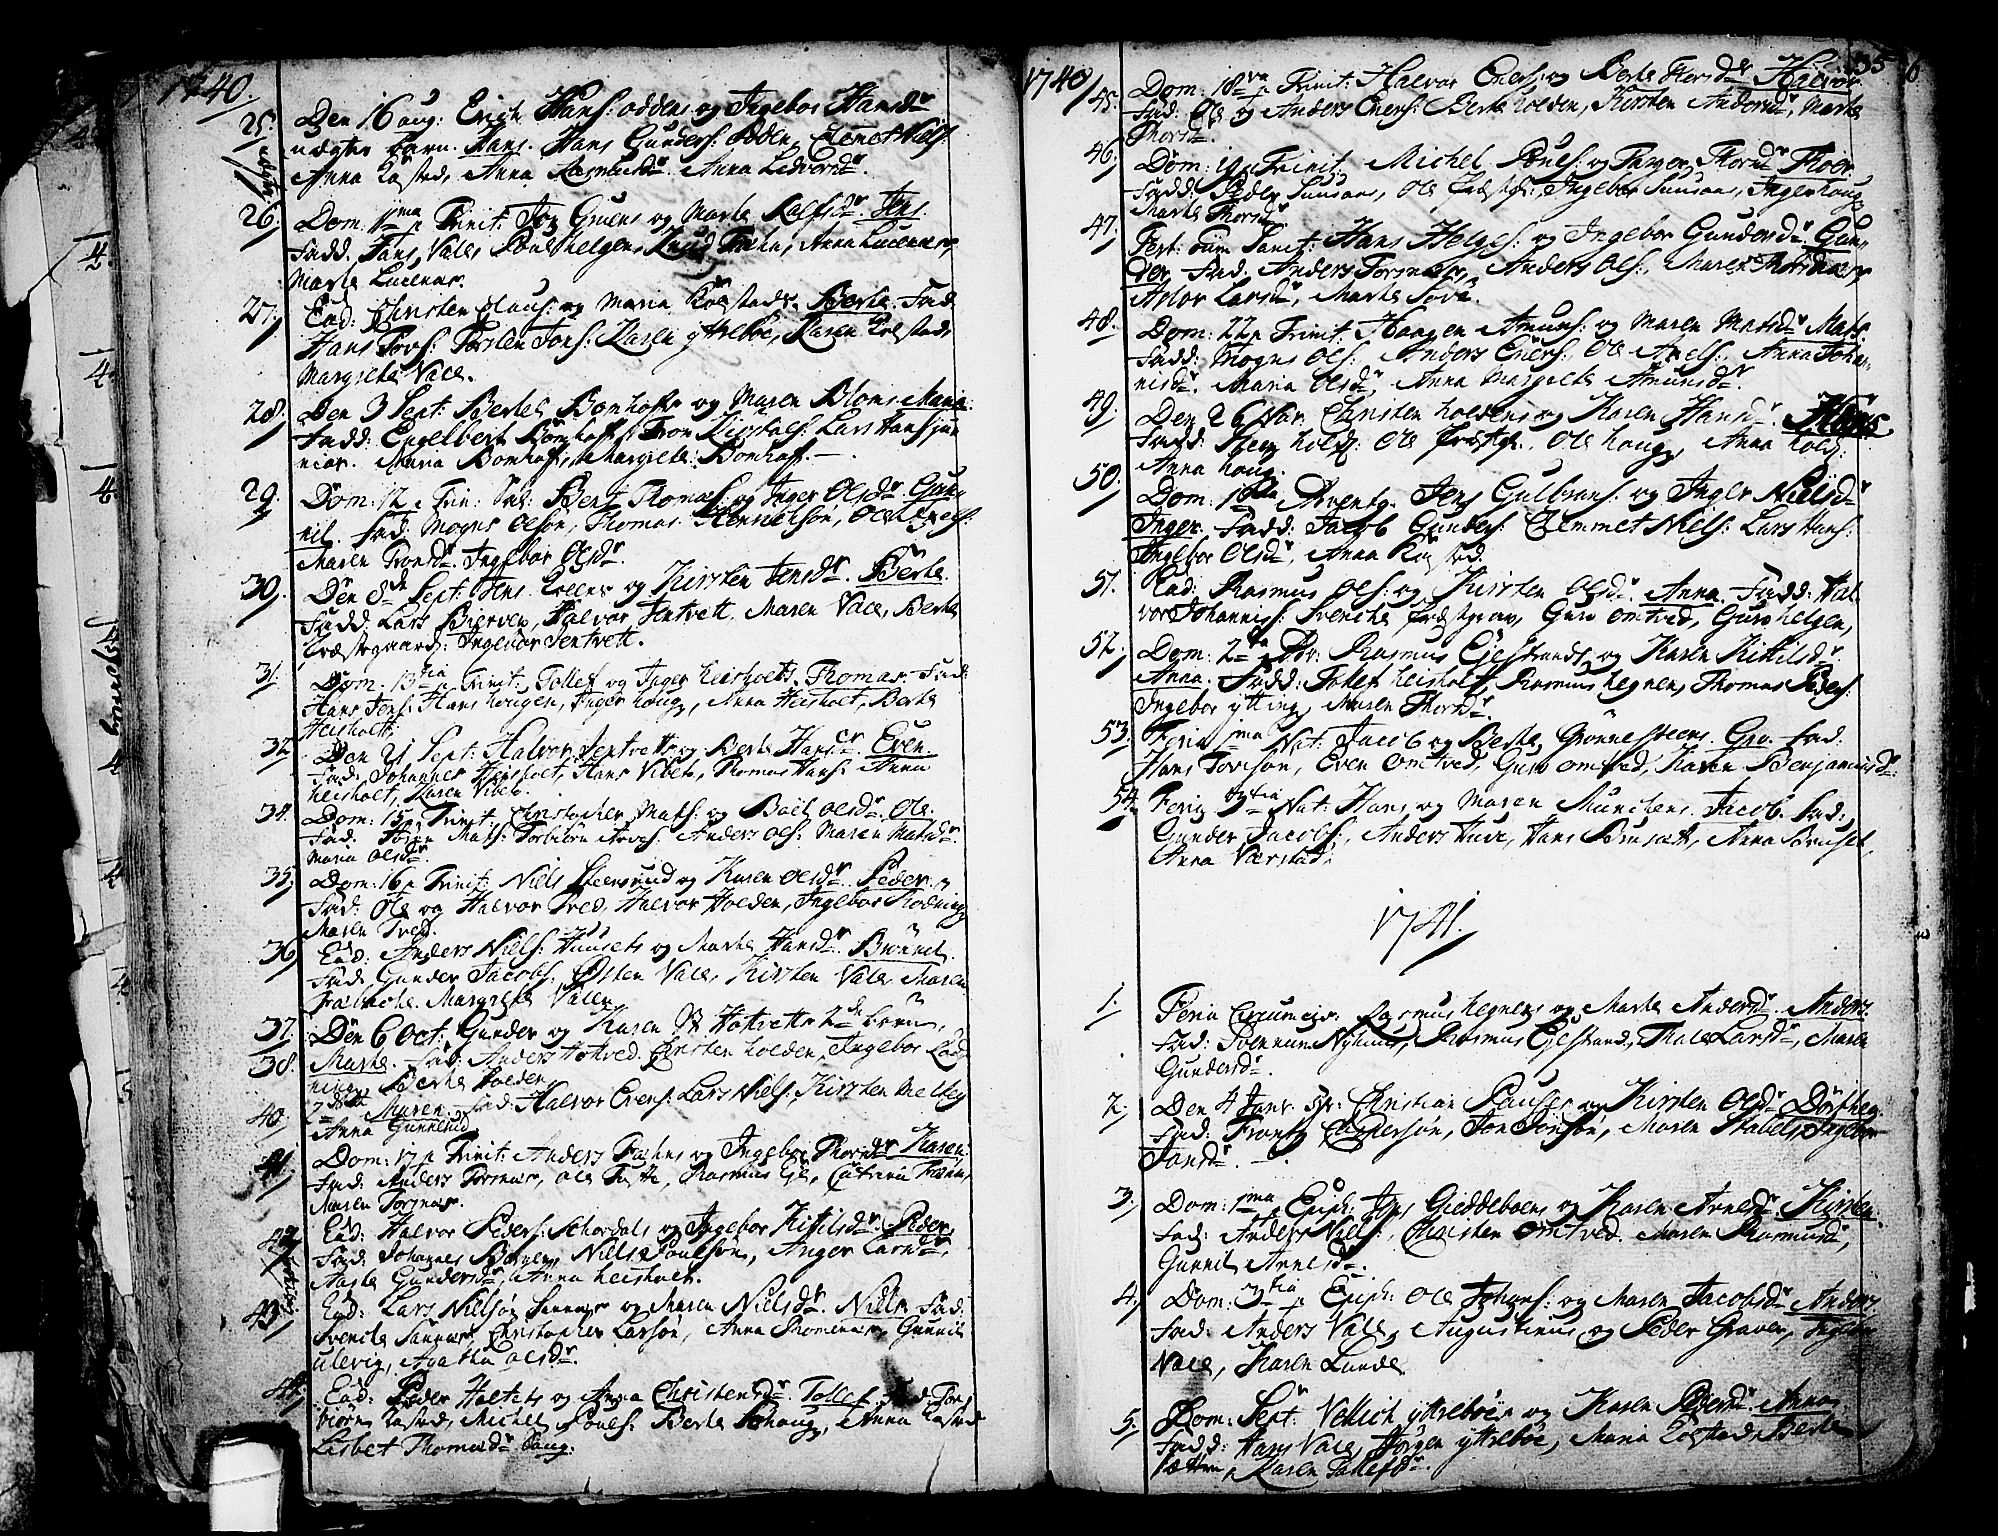 SAKO, Holla kirkebøker, F/Fa/L0001: Ministerialbok nr. 1, 1717-1779, s. 35